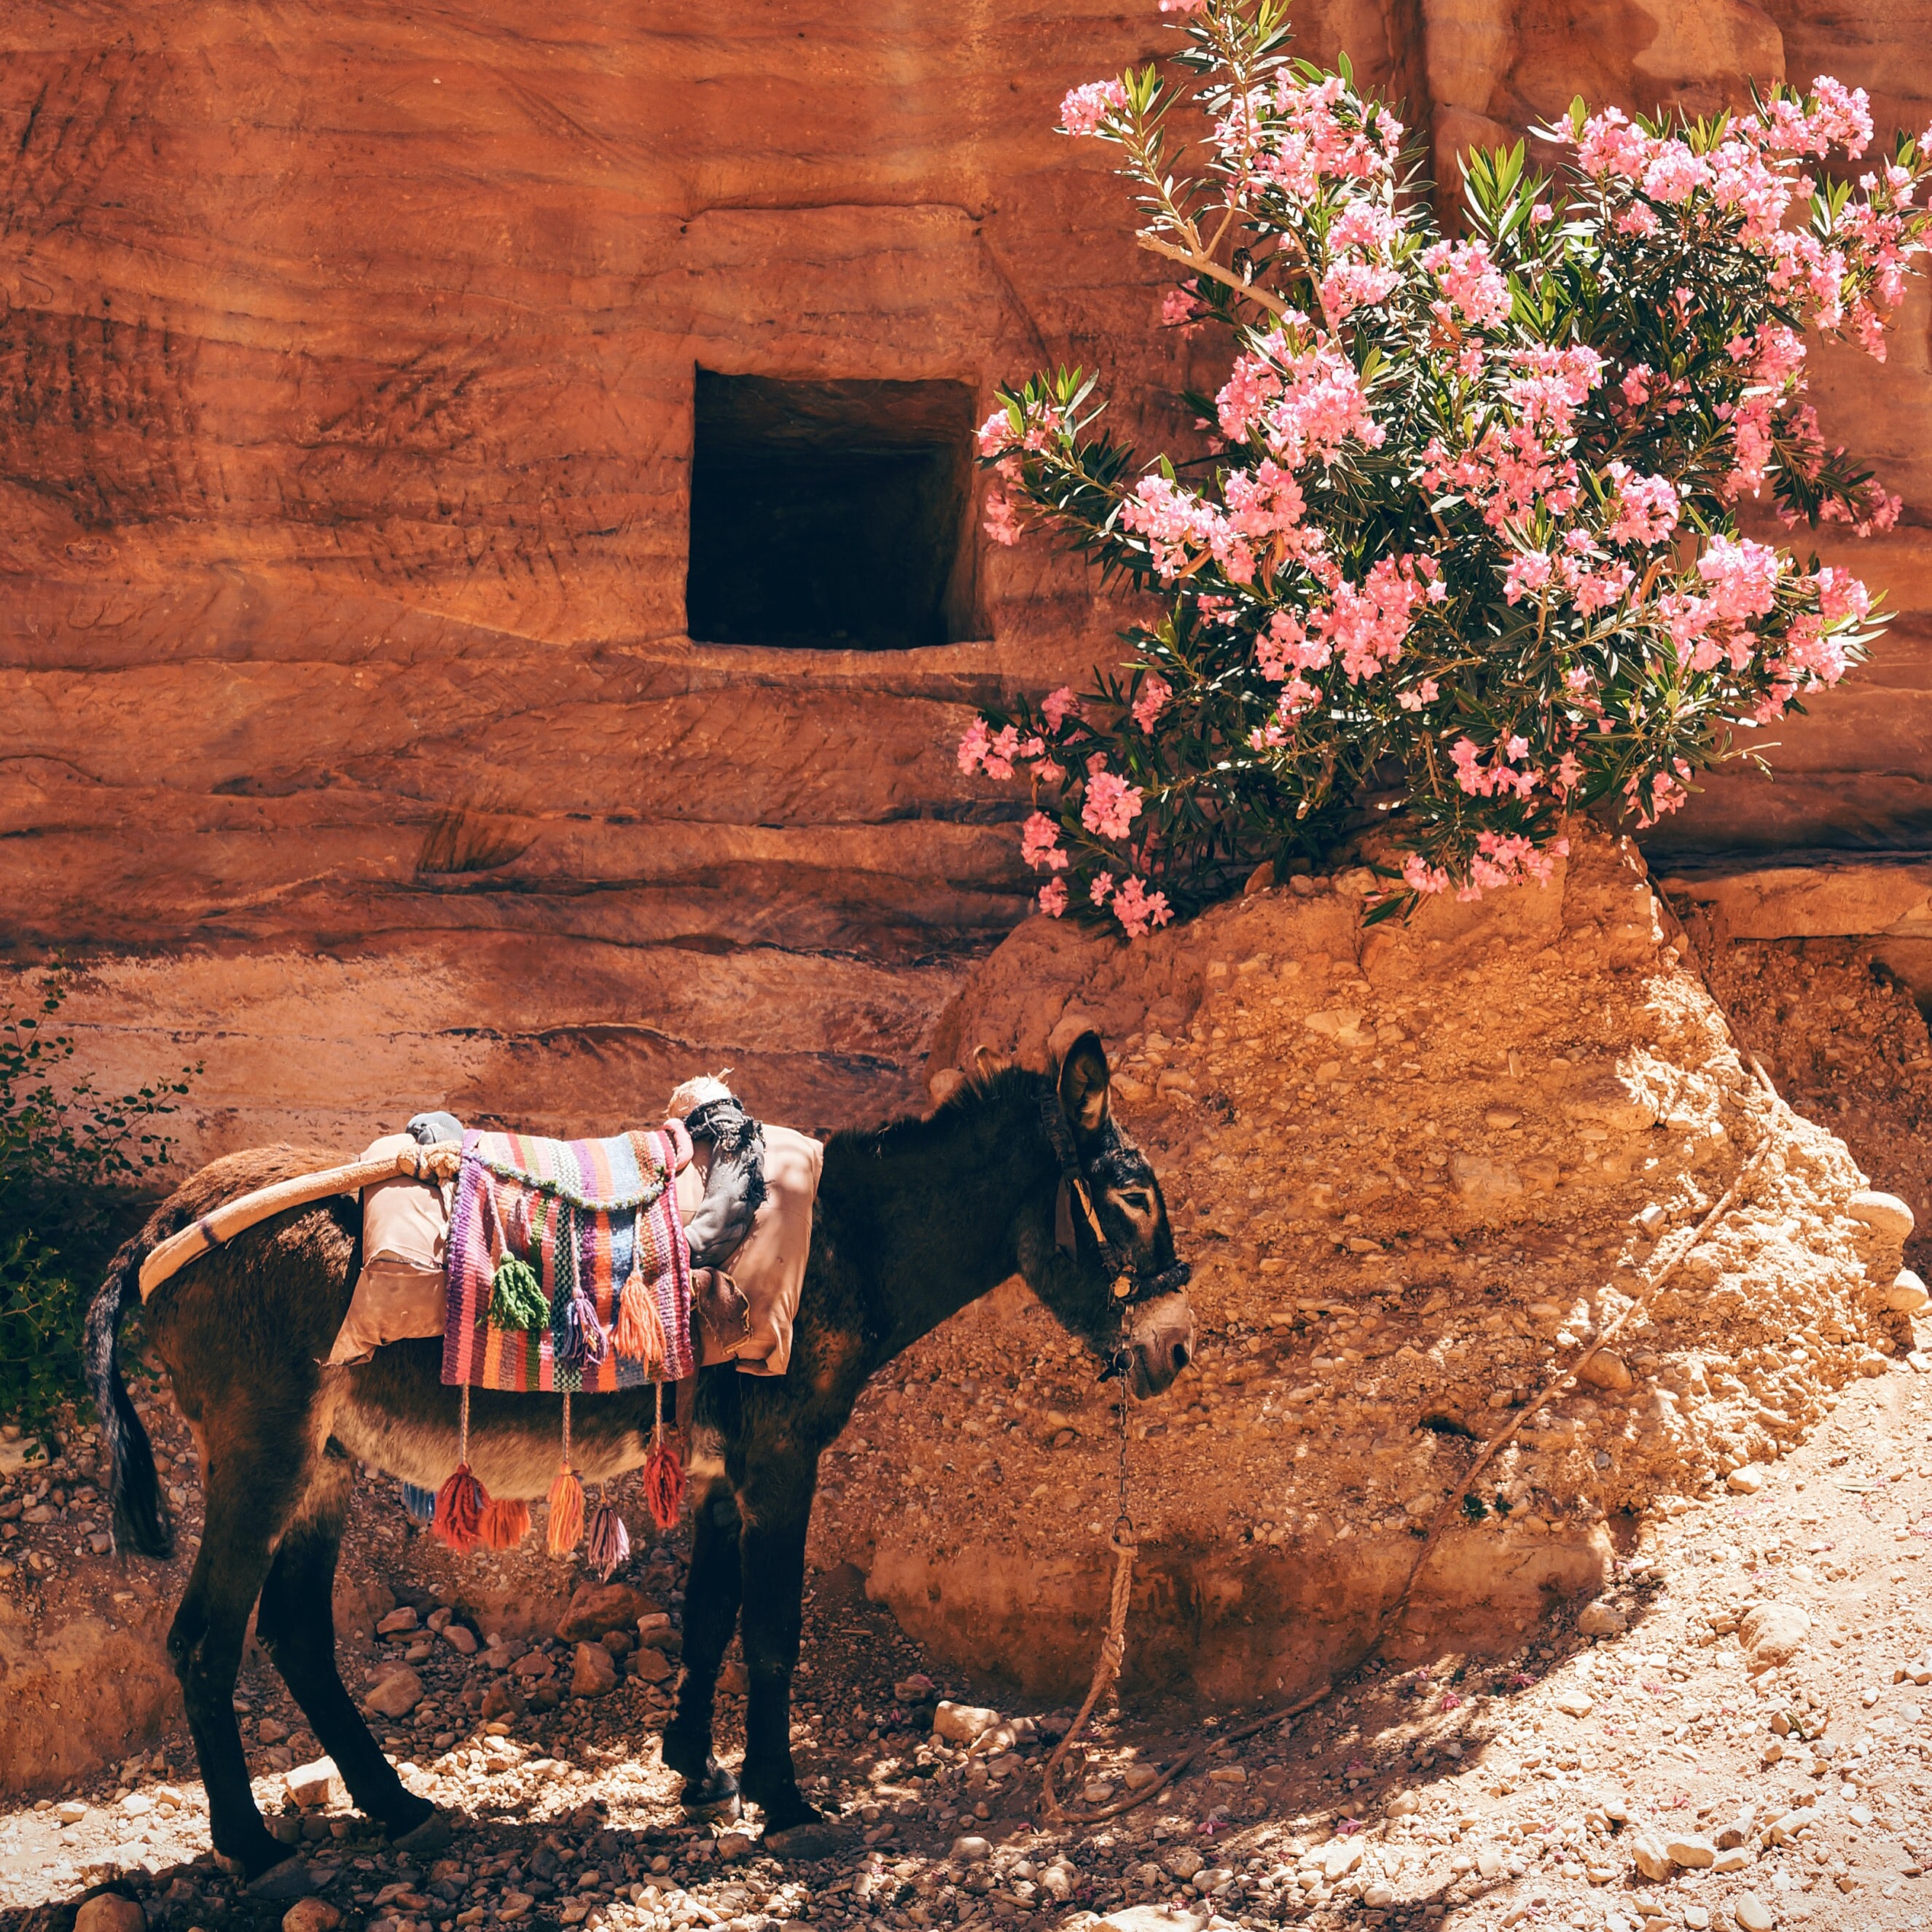 black donkey near the pink flowers